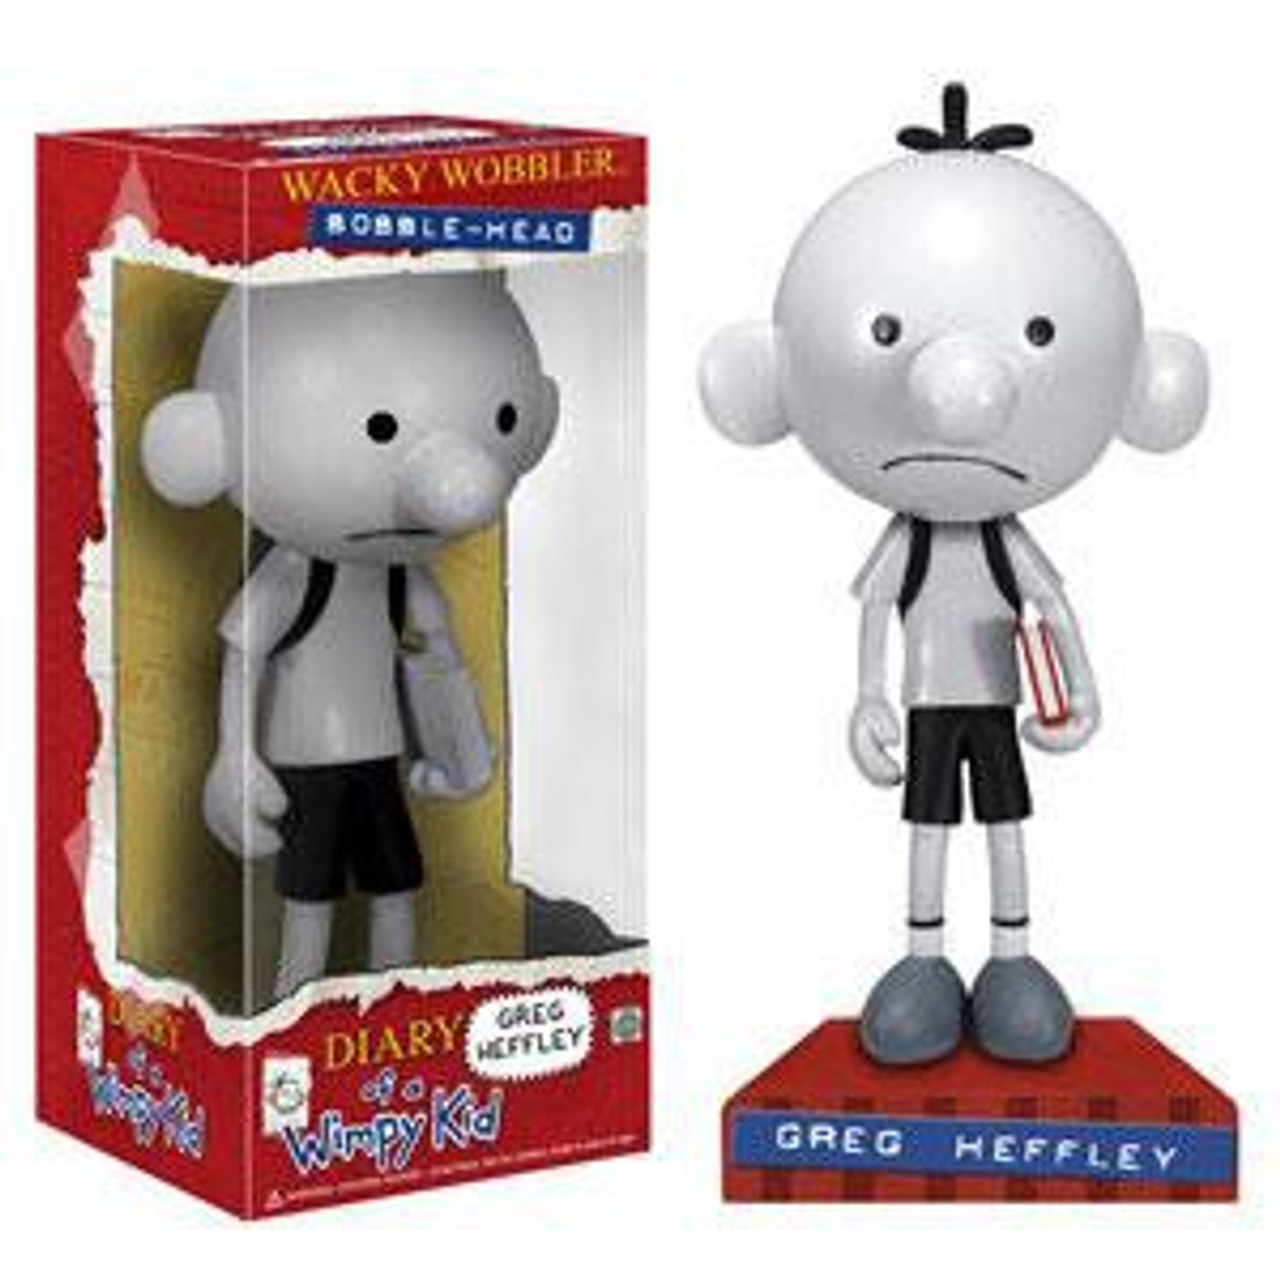 Funko Diary Of A Wimpy Kid Wacky Wobbler Greg Heffley Bobble Head Toywiz